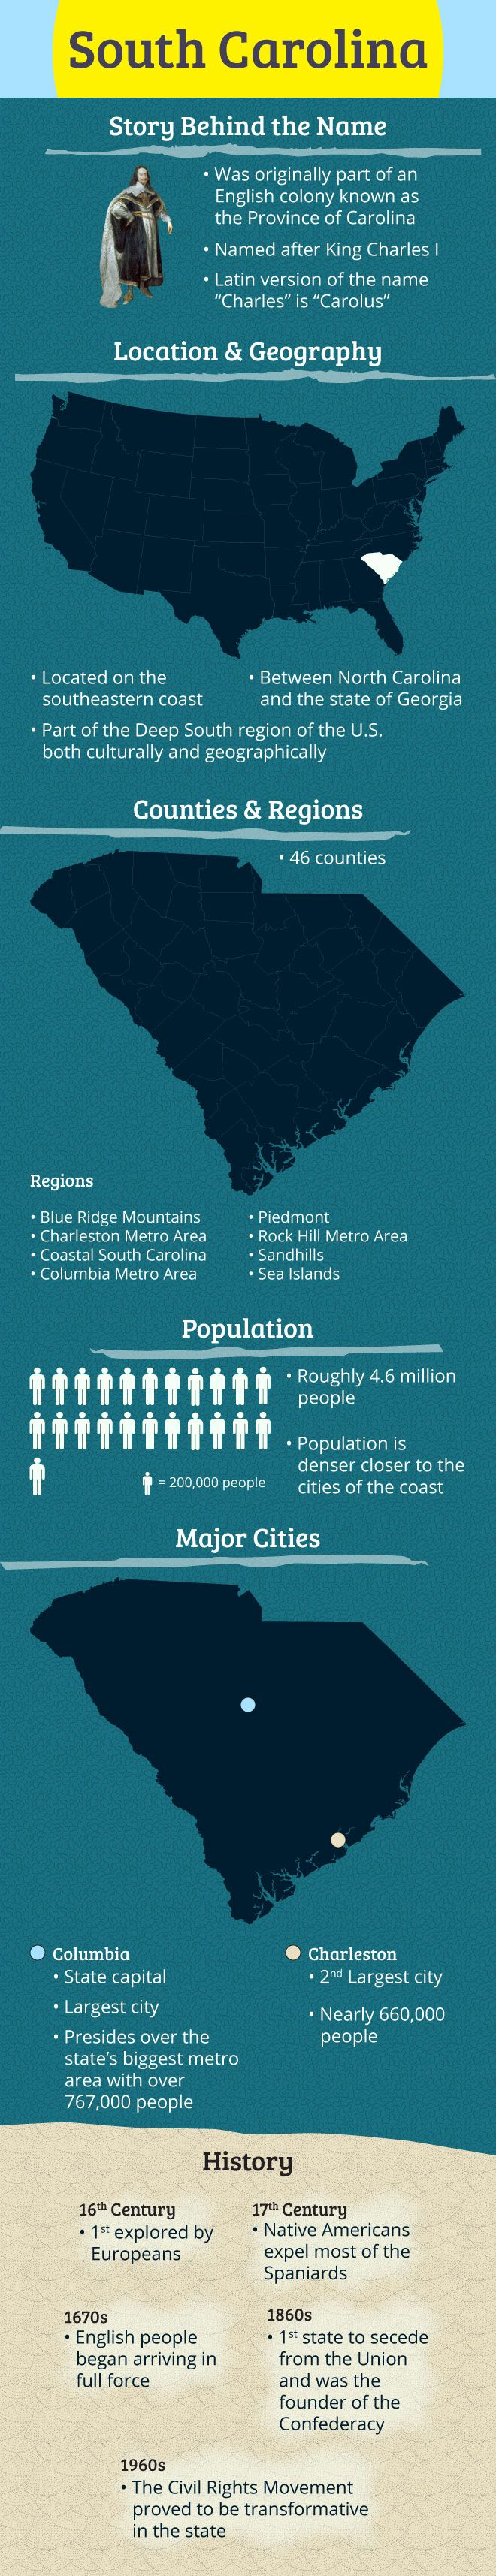 20 best Columbia, South Carolina images on Pinterest | Columbia ...